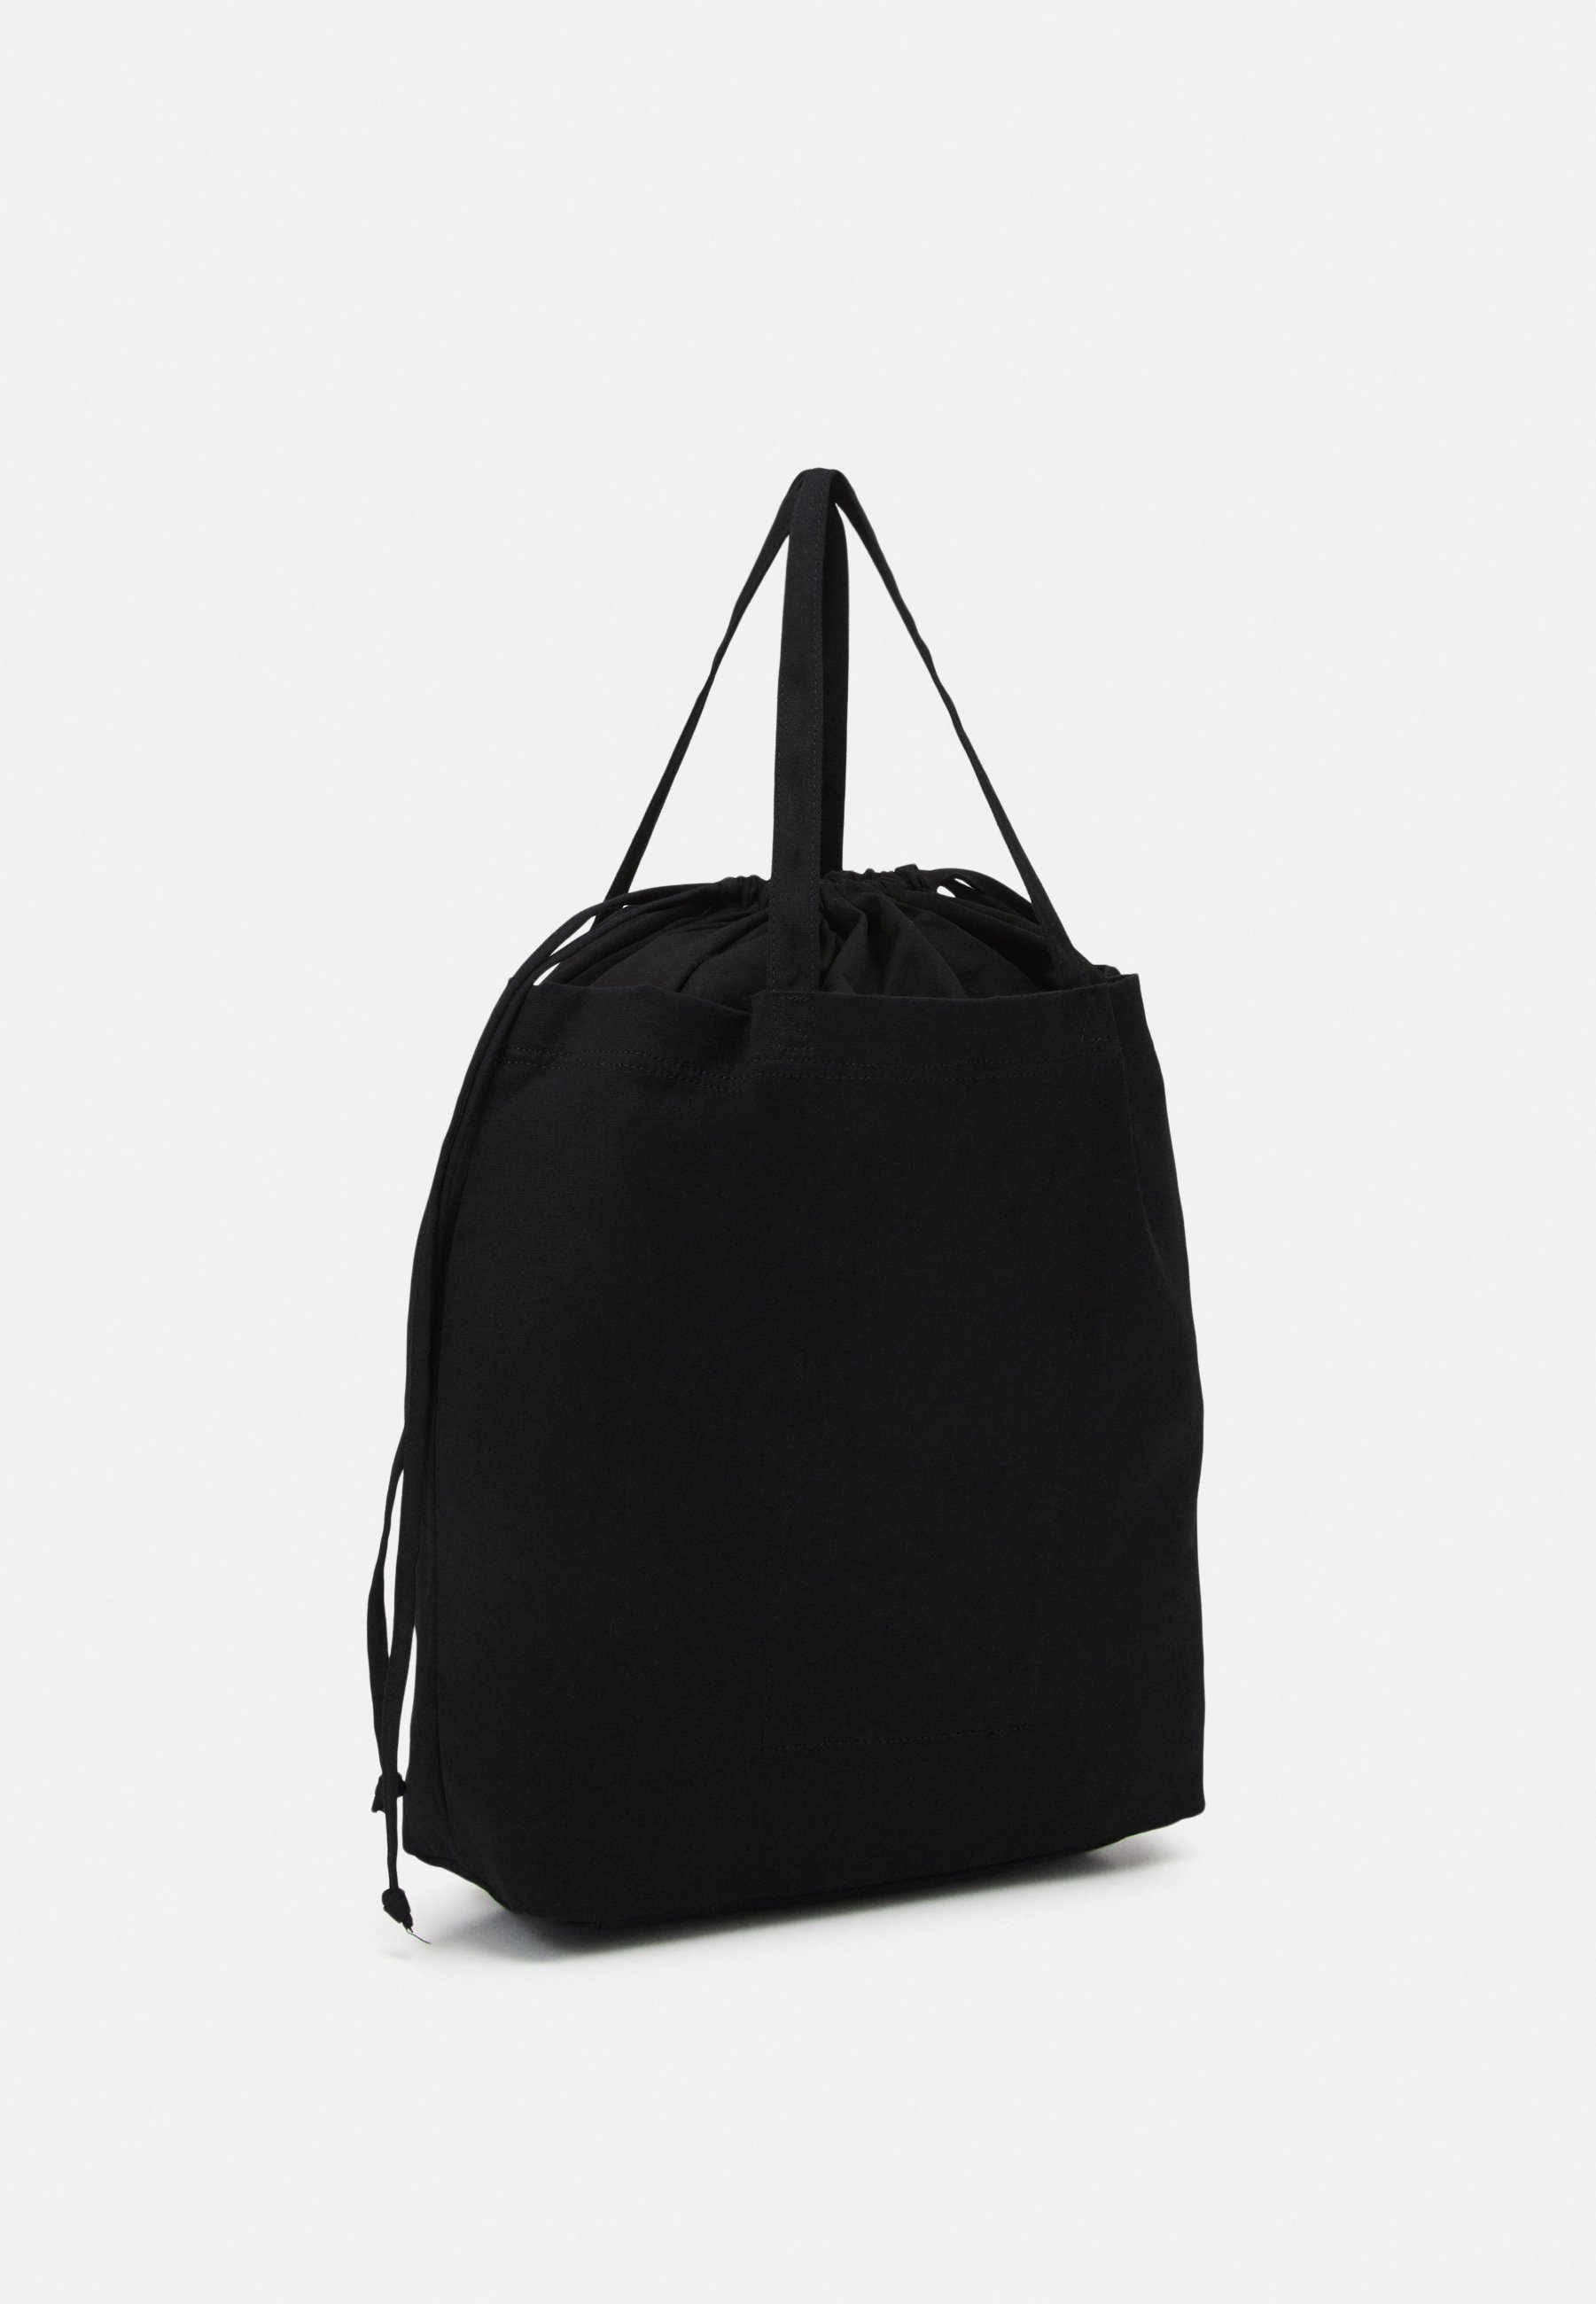 Women WOMEN'S DRAWSTRING TOTE - Tote bag